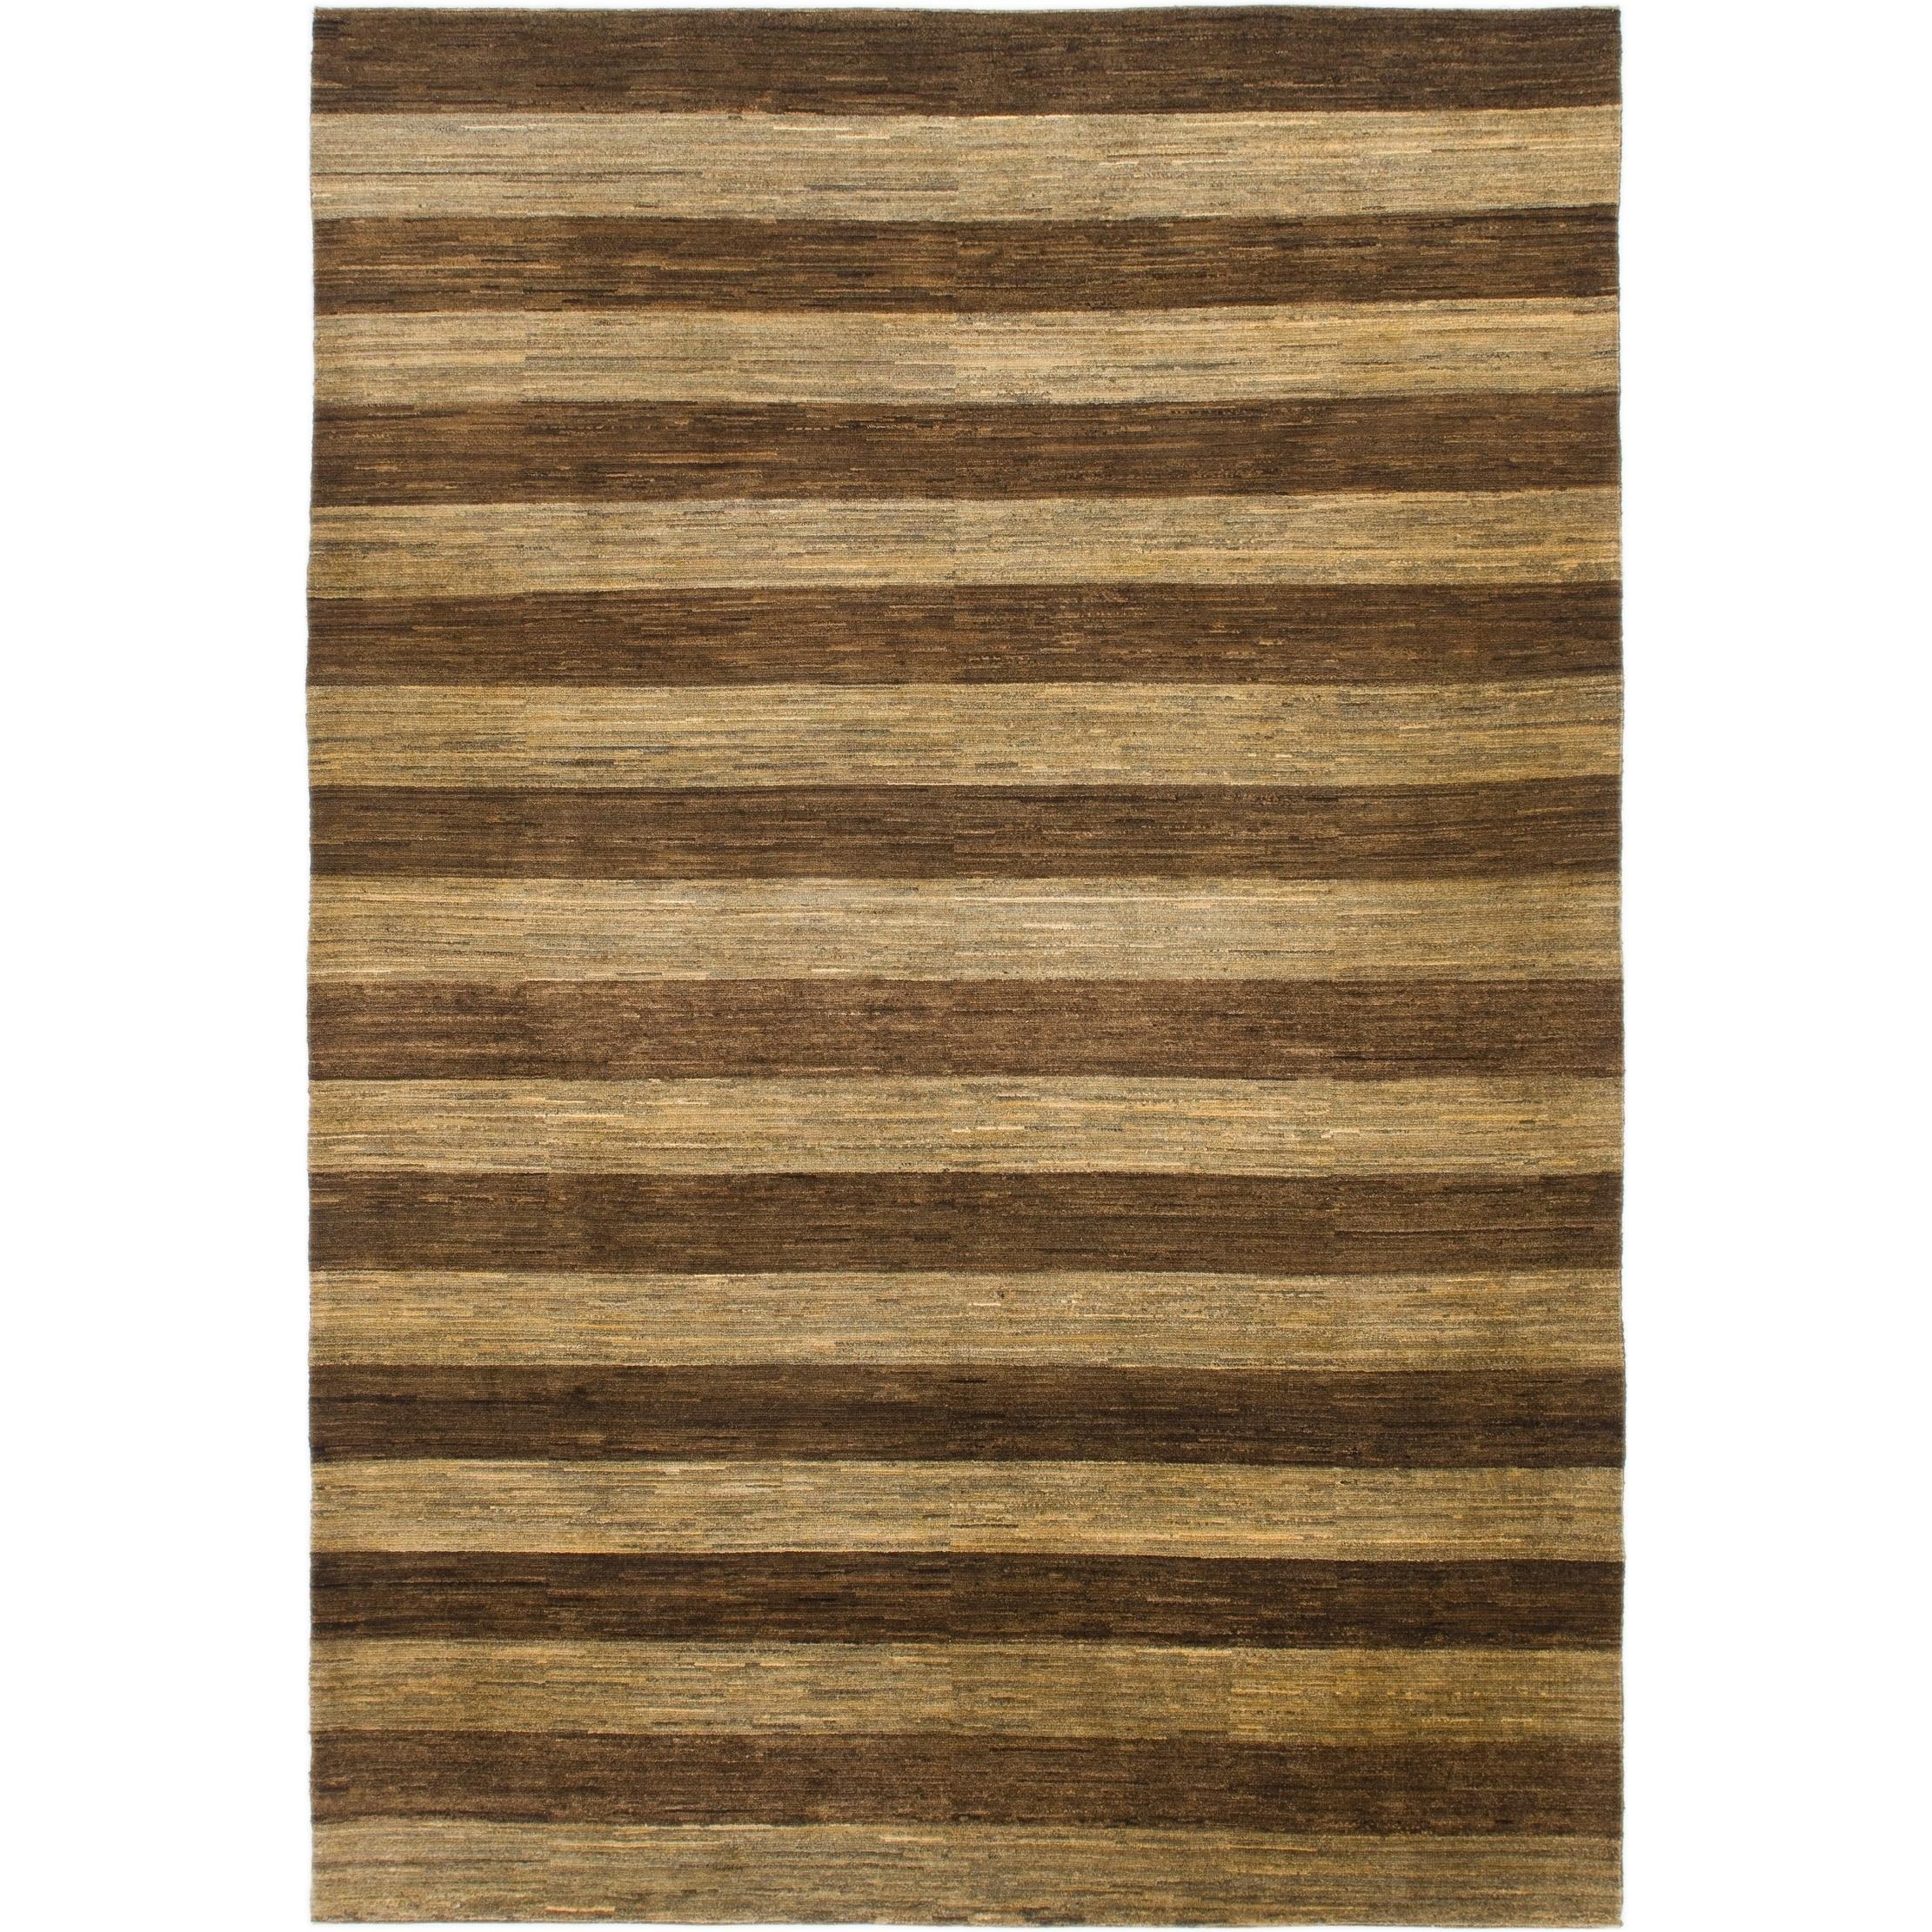 Hand Knotted Kashkuli Gabbeh Wool Area Rug - 6 8 x 9 8 (Brown - 6 8 x 9 8)